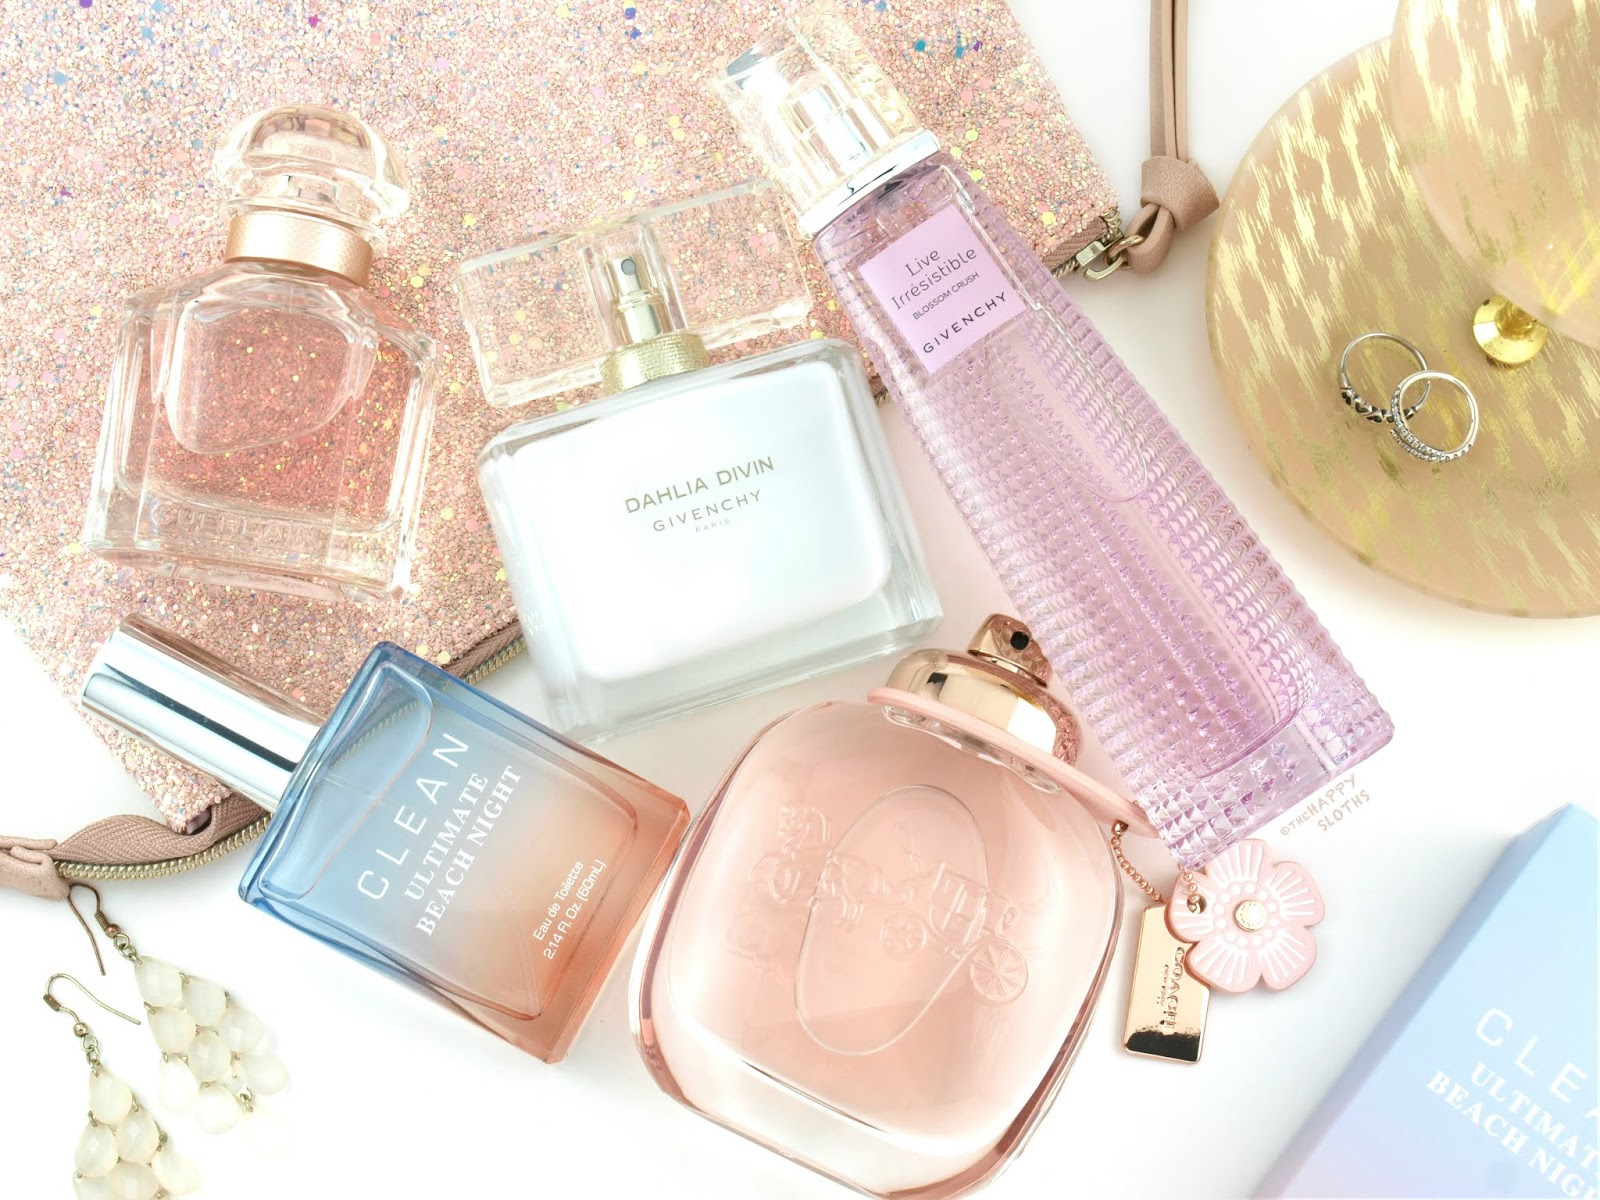 Spring & Summer 2018 Fragrance Reviews: Mon Guerlain Florale, Givenchy Dahlia Divin Eau Initiale, Givenchy Live Irresistible Blossom Crush, Clean Ultimate Beach Night,  Coach Floral Eau de Parfum